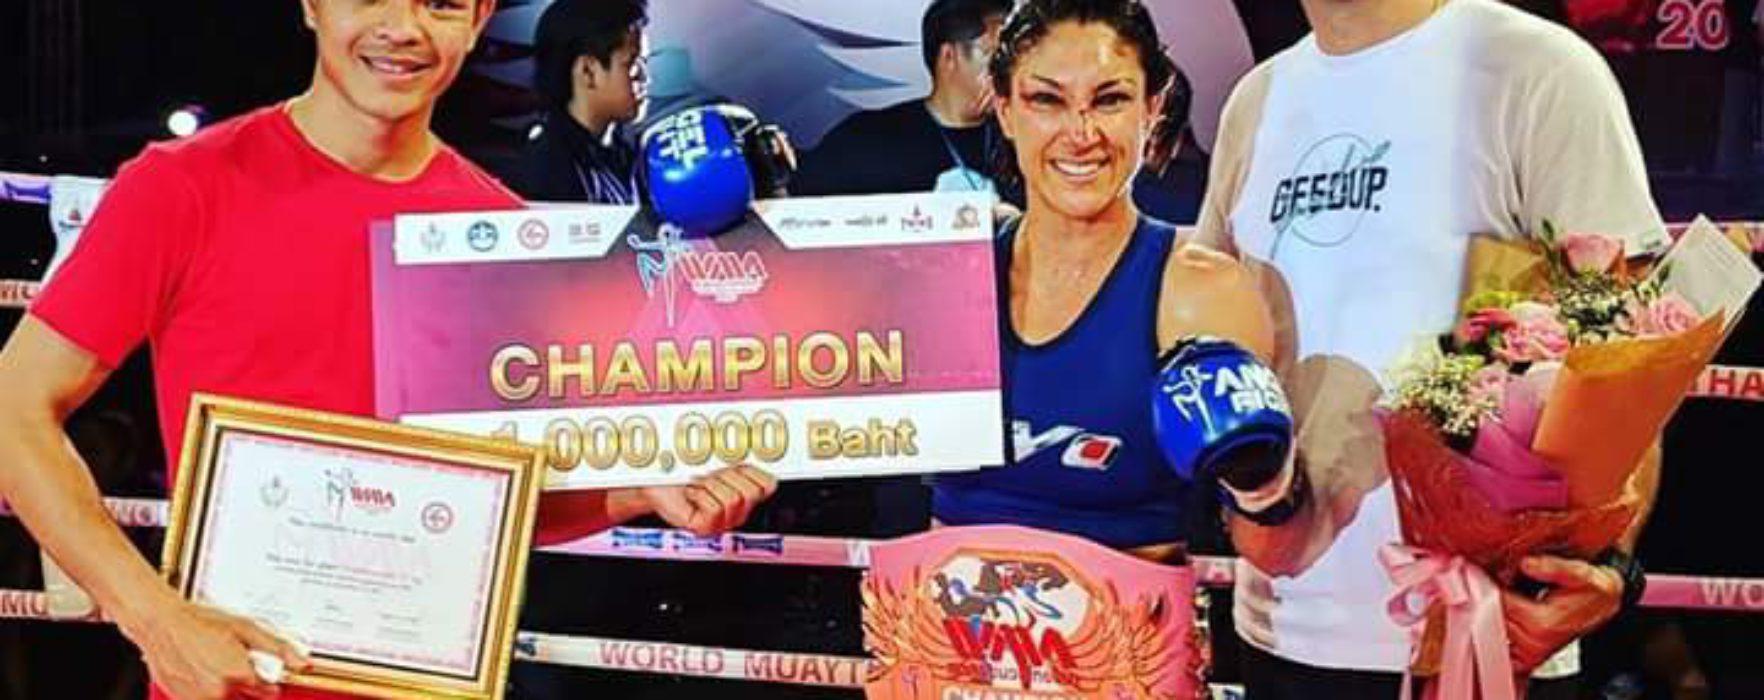 Yolanda Schmidt domina a Muay Thai Angels 2017